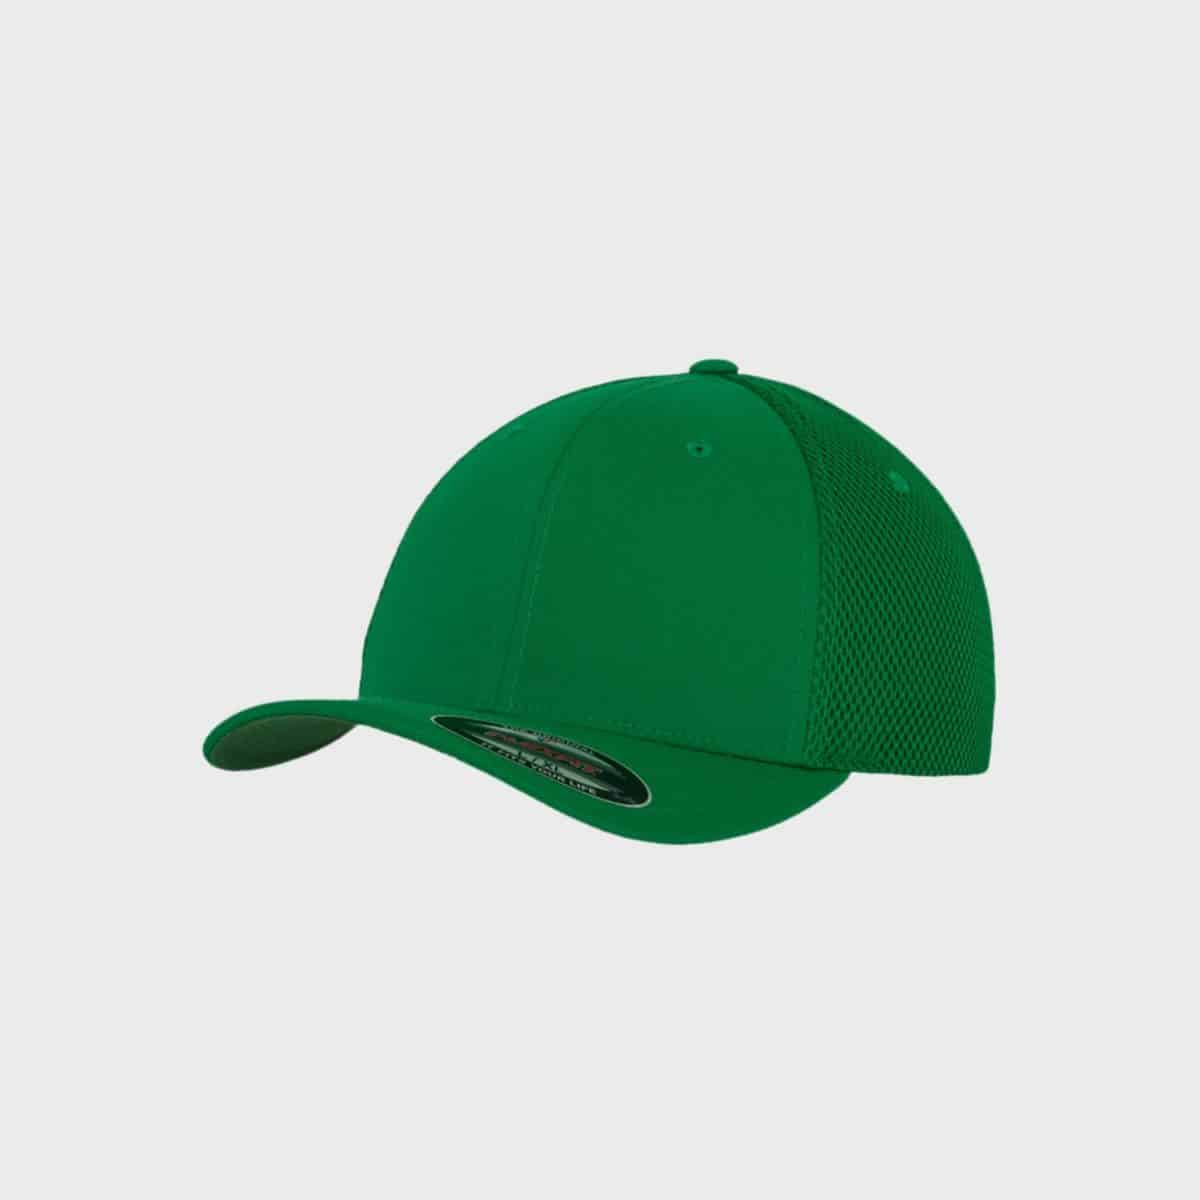 Flexfit FlexfitCaps FFE 6533 Green Front Side